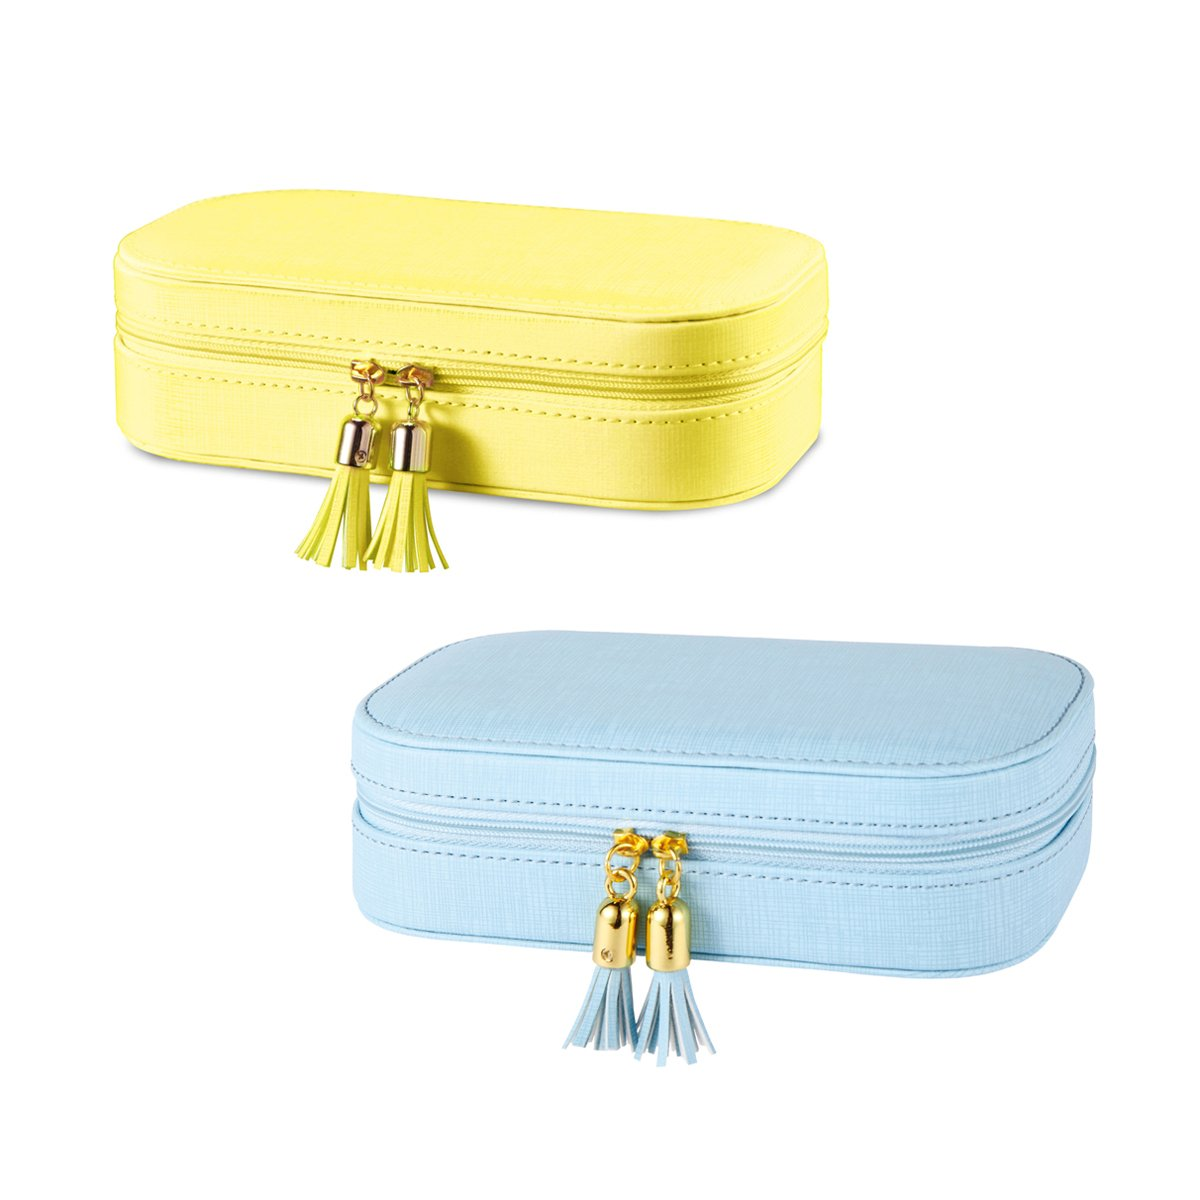 Vlando Small Tassel Travel Jewelry Box Organizer Display Storage Case for Girls Women (NEW TASSEL DESIGN (YELLOW + BLUE))